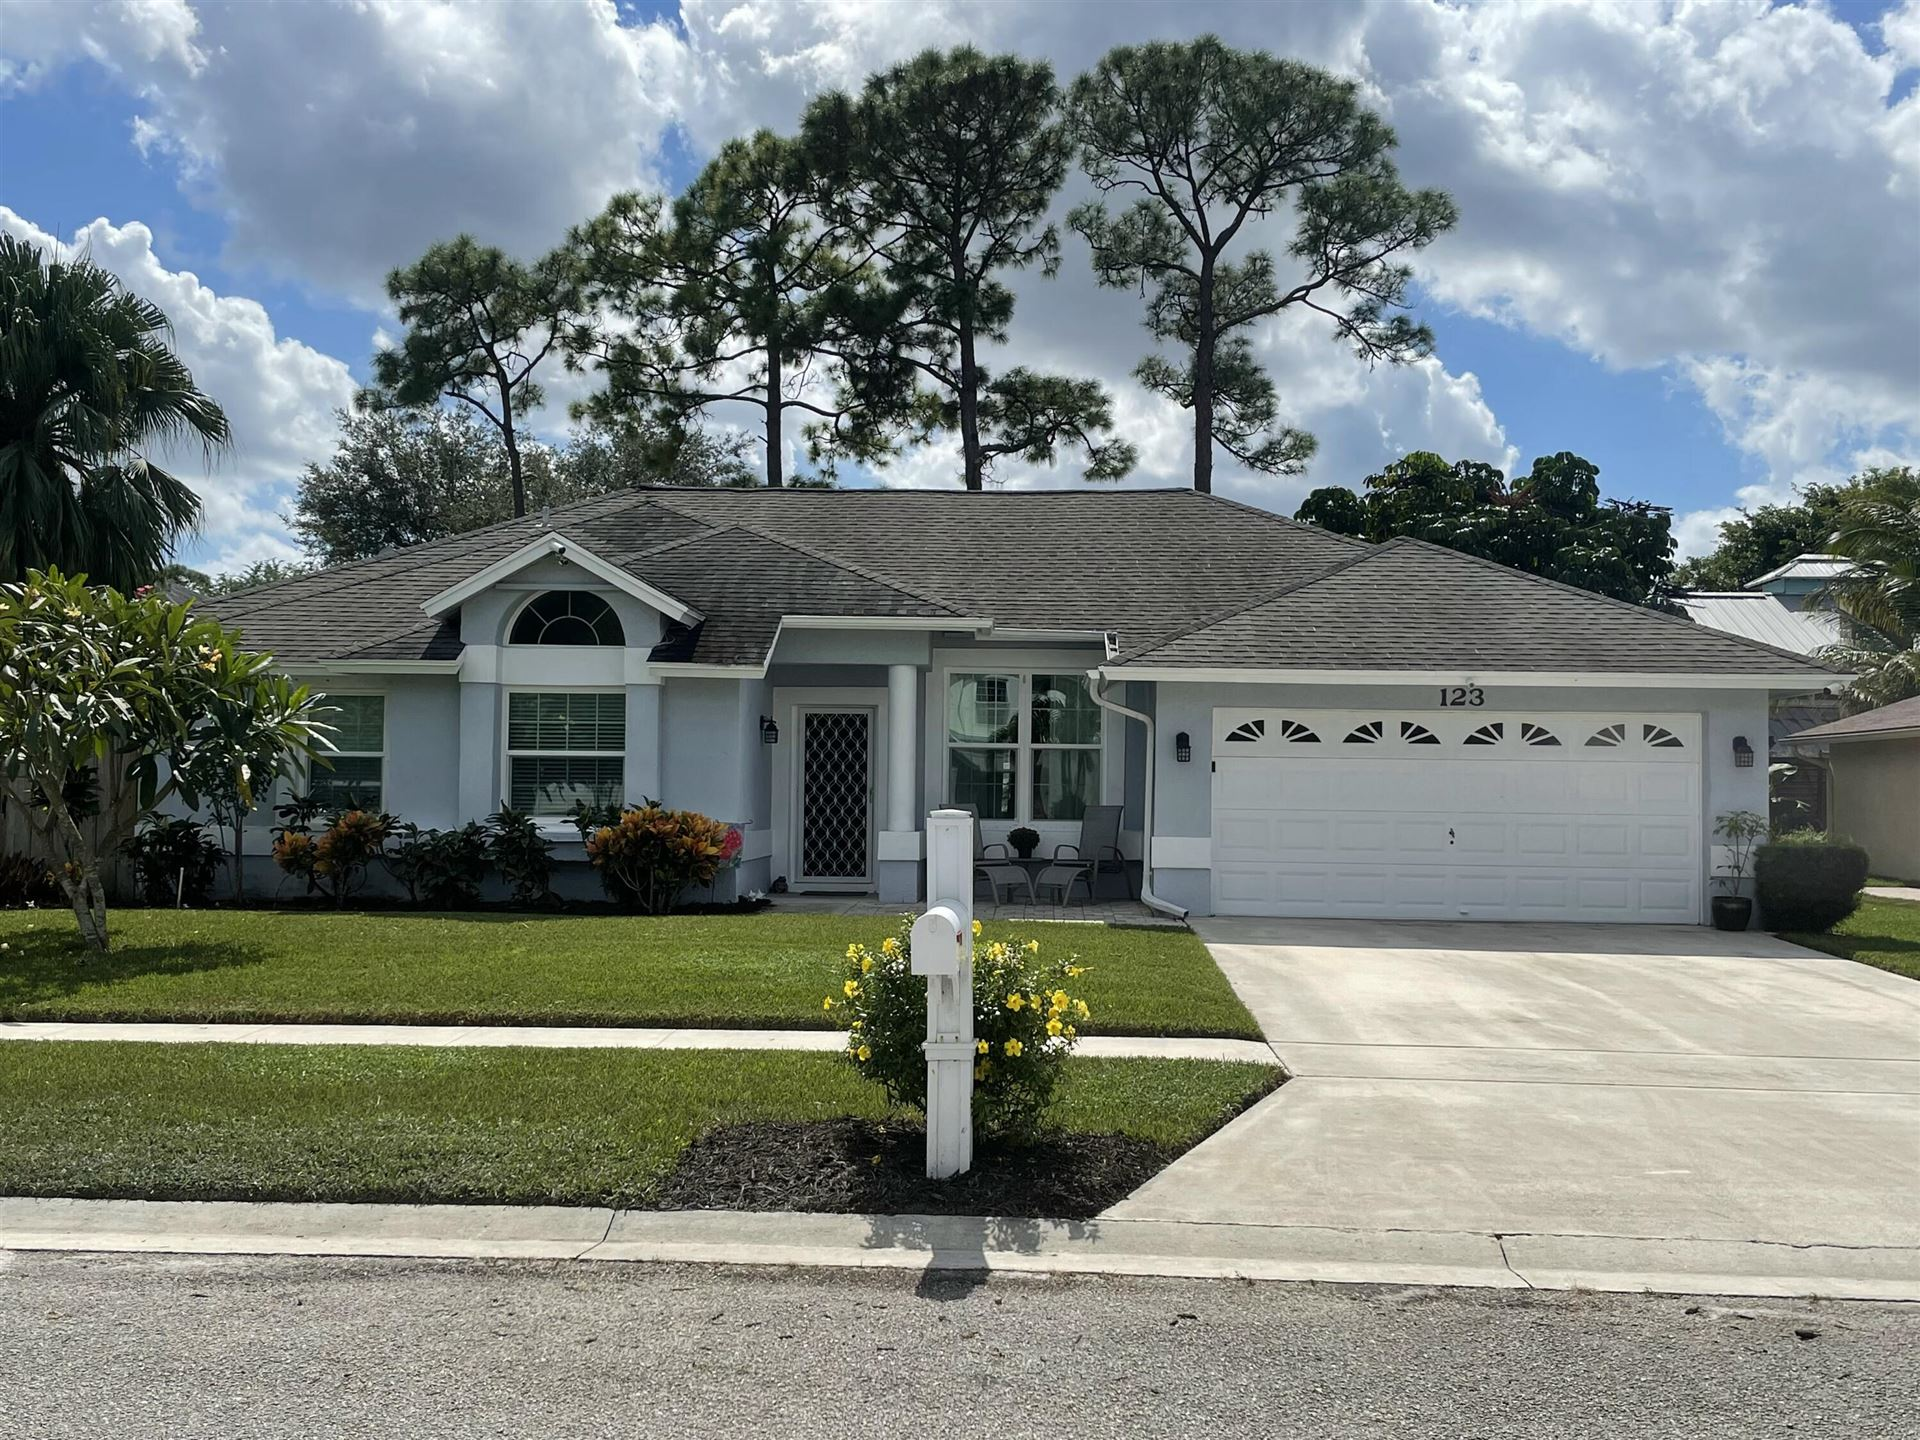 123 Royal Pine Circle N, Royal Palm Beach, FL 33411 - MLS#: RX-10752946